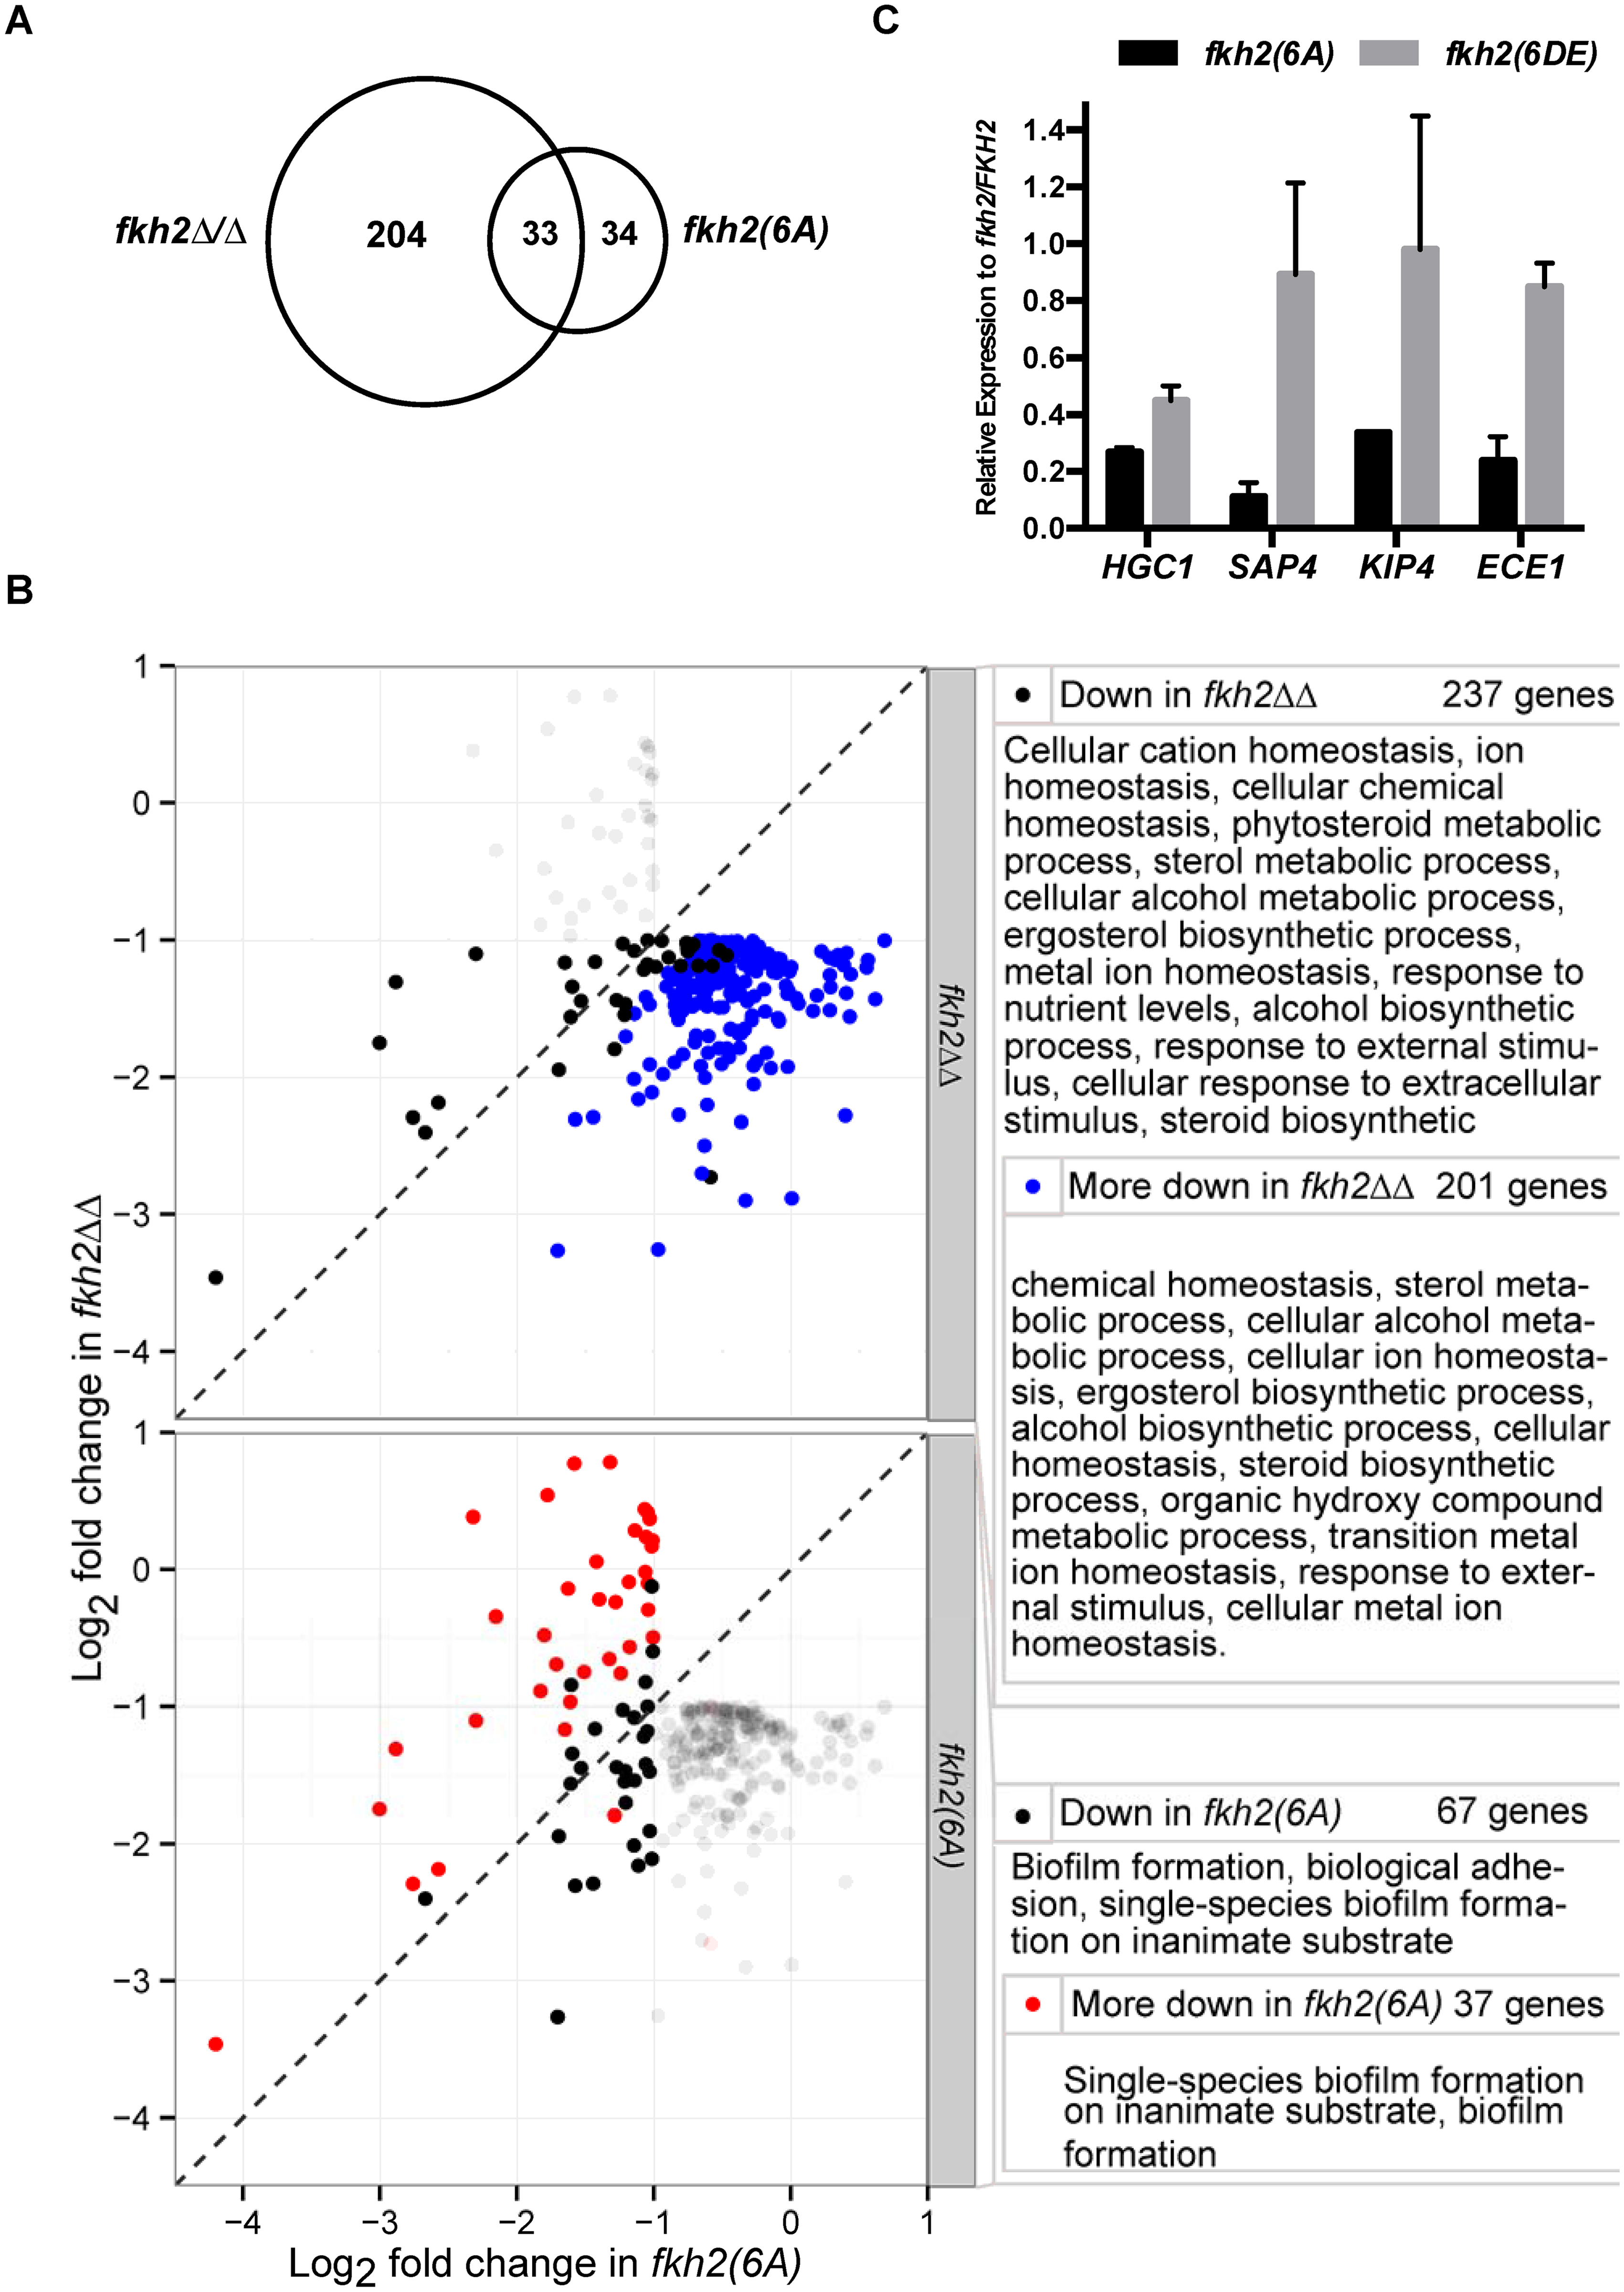 GO analysis of <i>fkh2(6A)</i> and <i>fkh2ΔΔ</i> mutants.